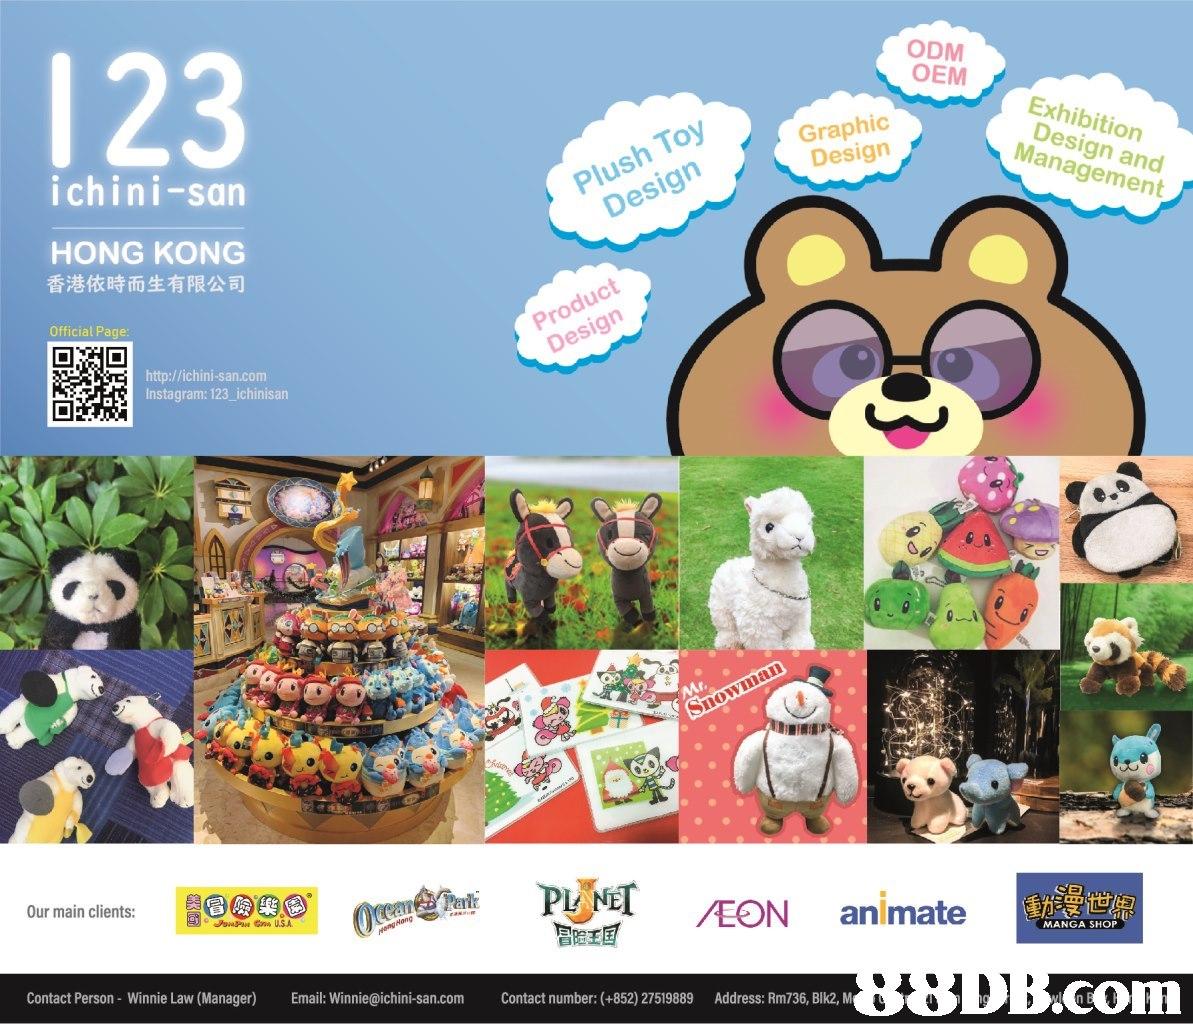 123 ODM OEM Exhibition Design and Management Plush Toy Design Graphic Design ichini-san HONG KONG 香港依時而生有限公司 Official Page Product Design http://ichini-san.com Instagram: 123 ichinisan eht PIO /EON animate a9eggio m Our main clients: MANGA SHOP Contact Person- Winnie Law (Manager) mail: Winnie@ichini-san.com Contact number: (+852) 27519889 Address: Rm736, Blk2, M TOM,Cartoon,Organism,Illustration,